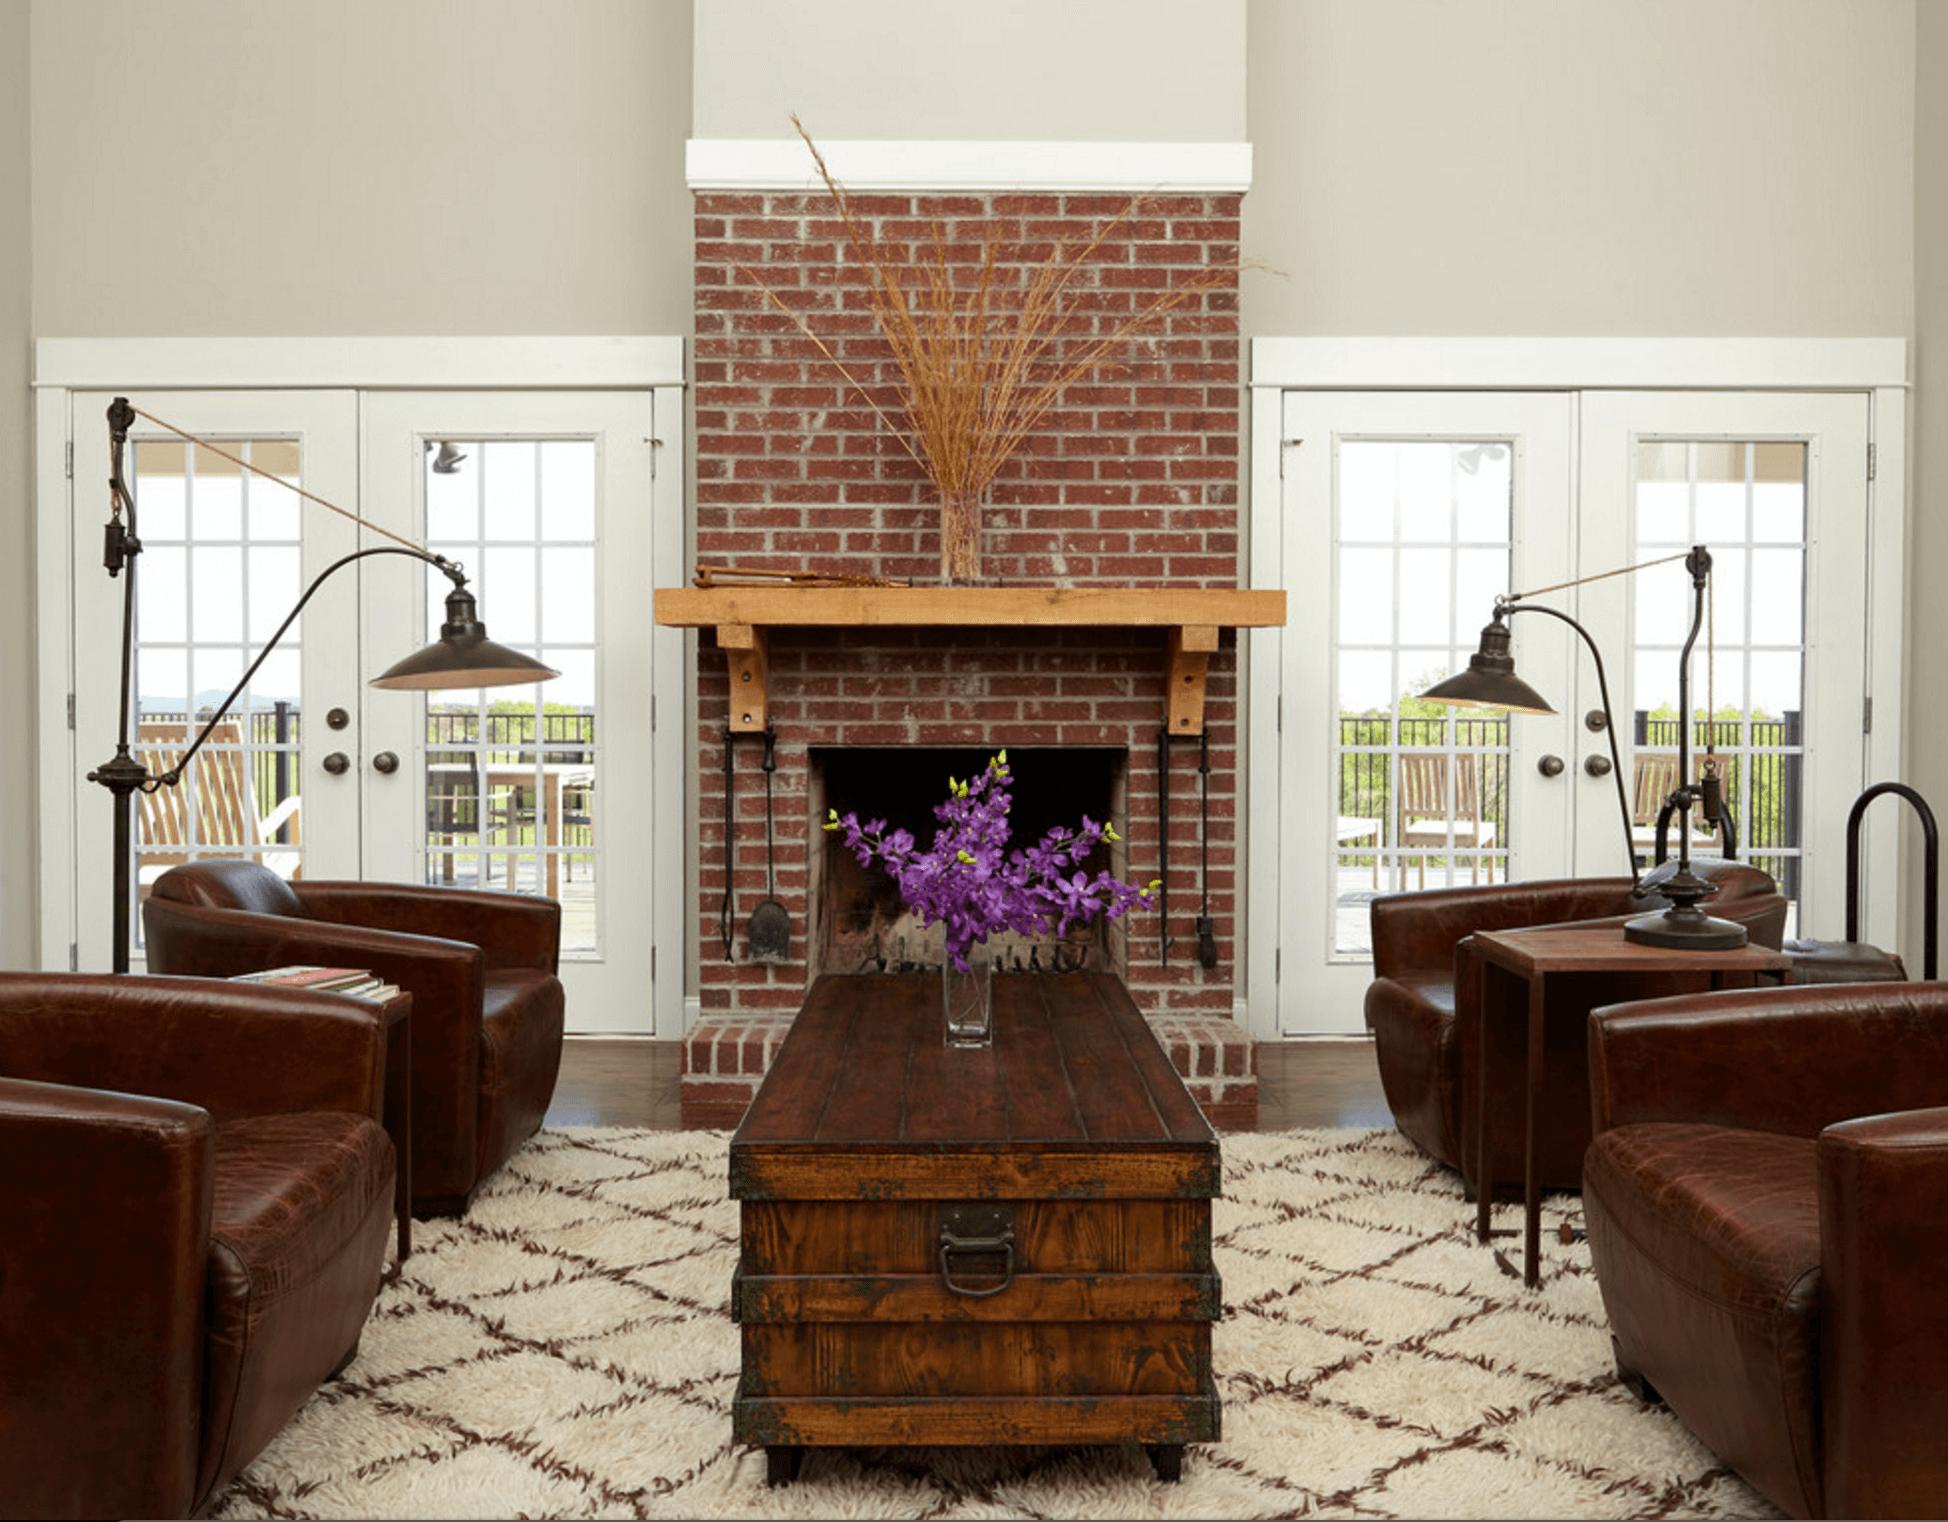 Mantel Decorating Ideas Red Brick Fireplaces Painted Brick Fireplaces Fireplace Mantel Decor